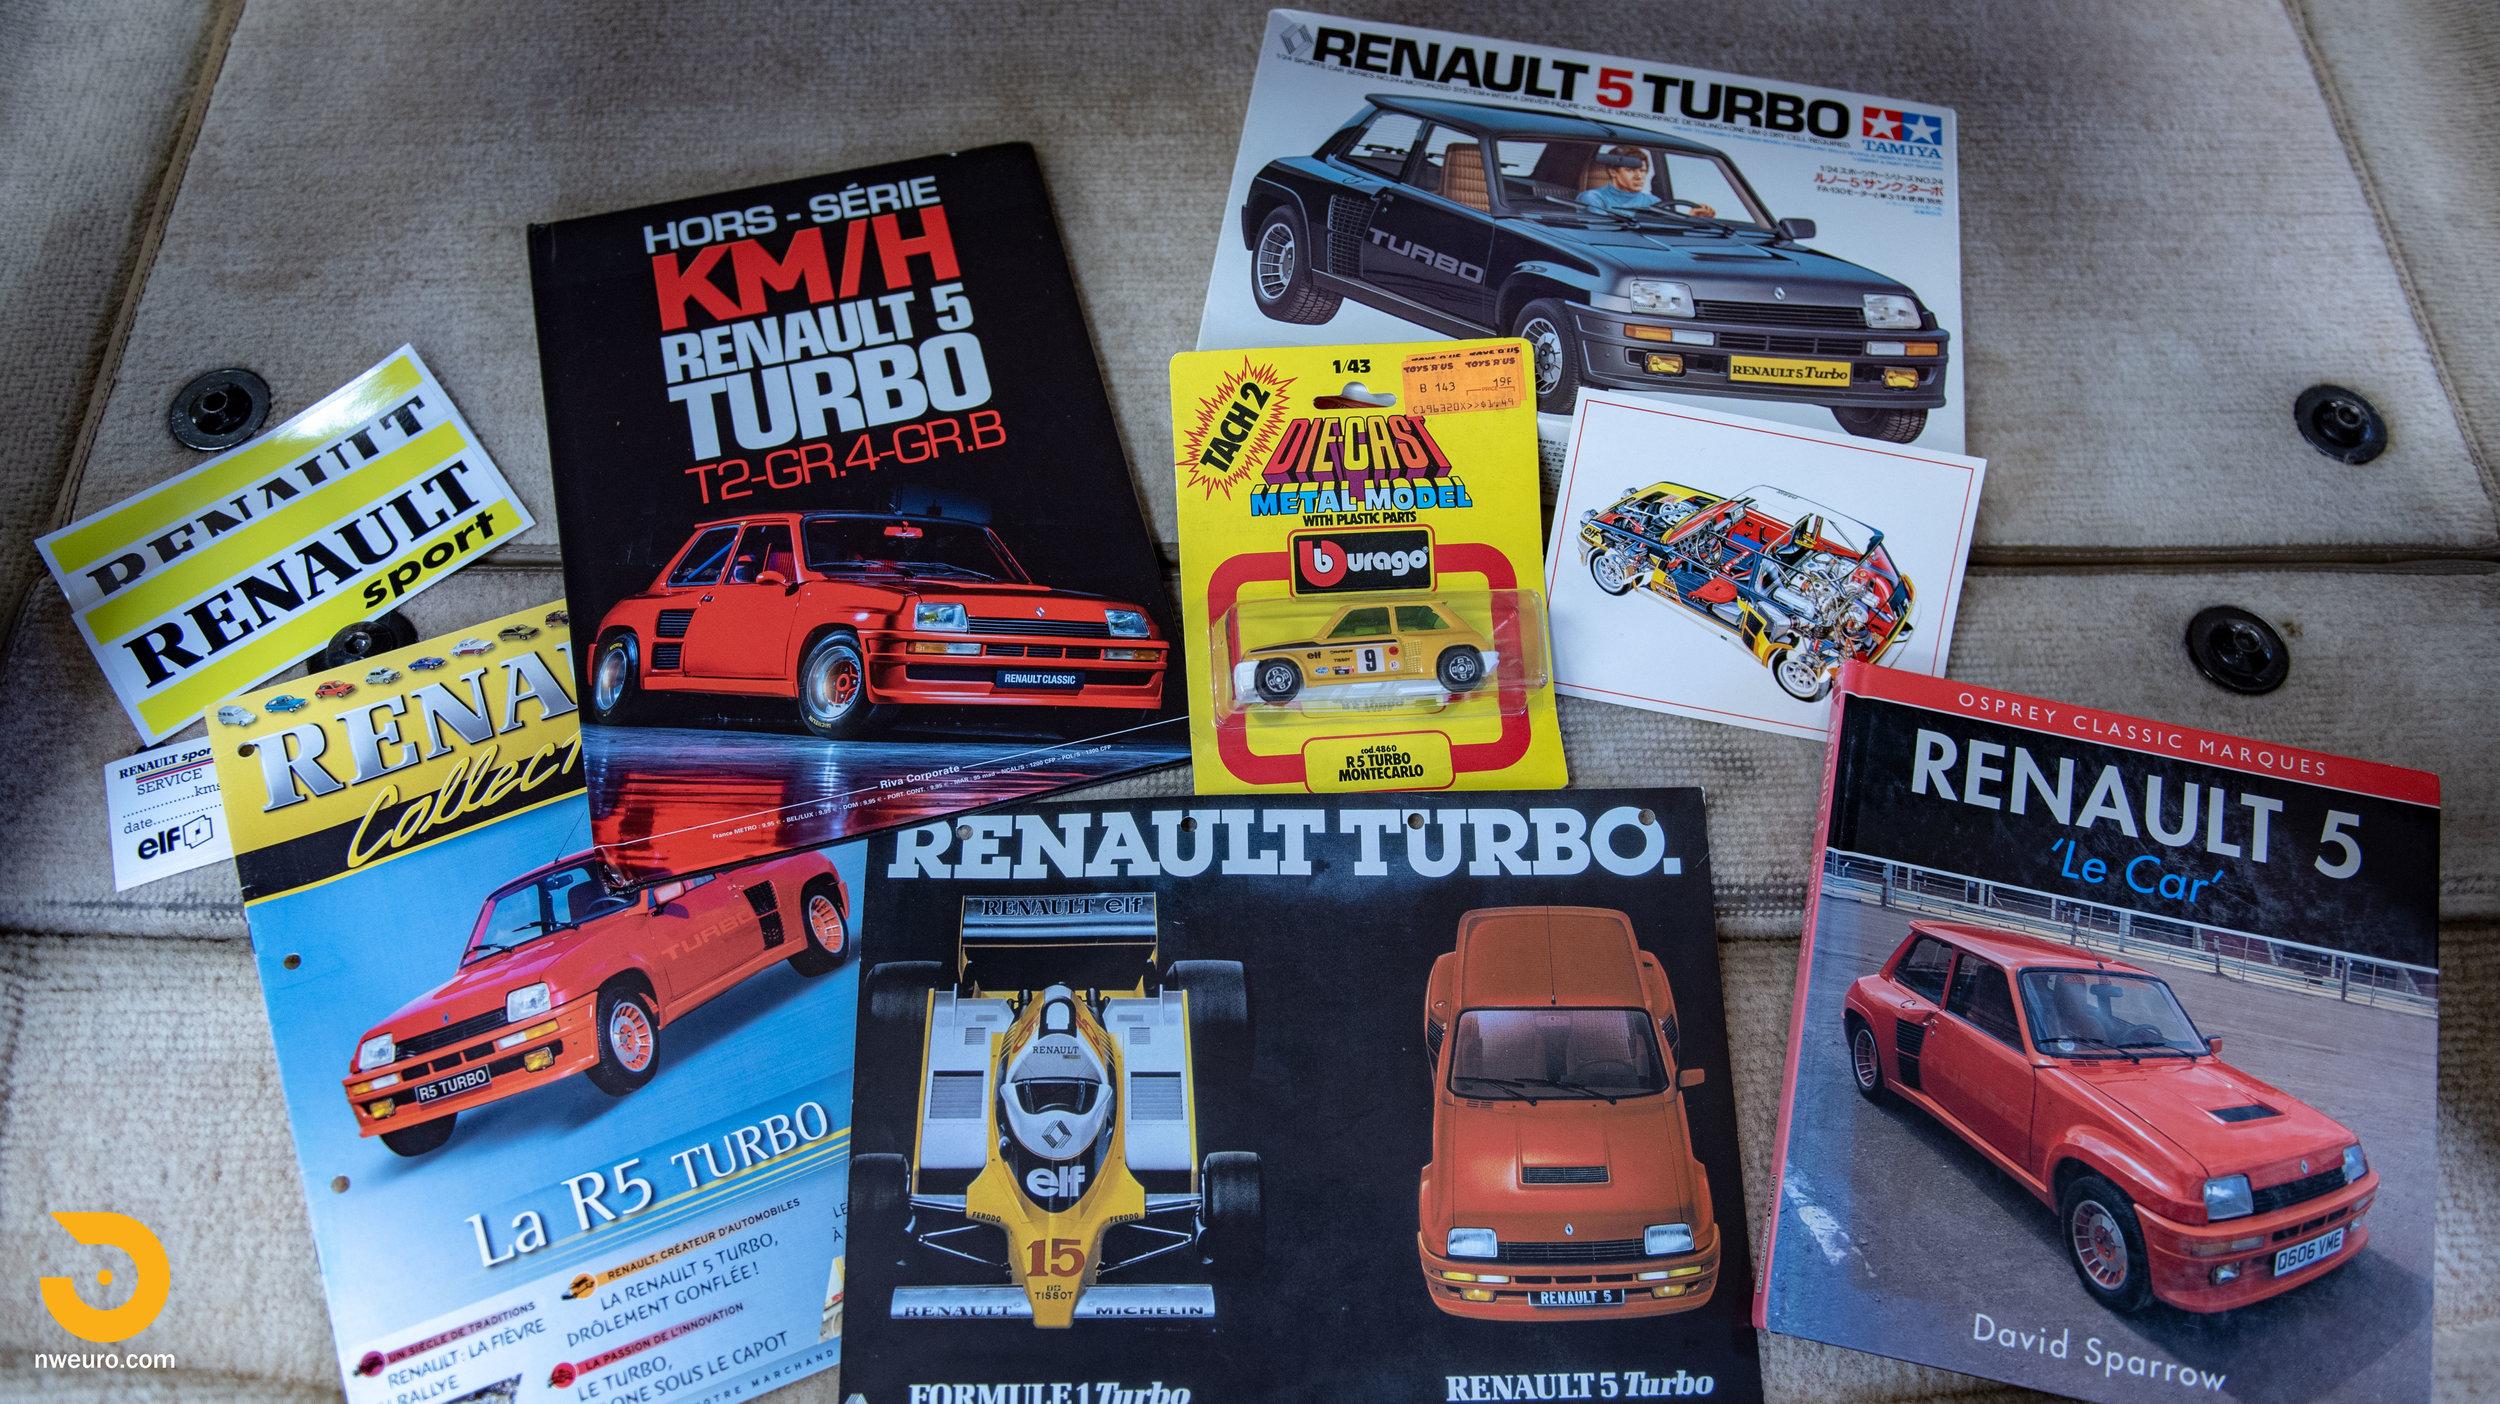 1983 Renault R5 Turbo 2 Extras-1.jpg